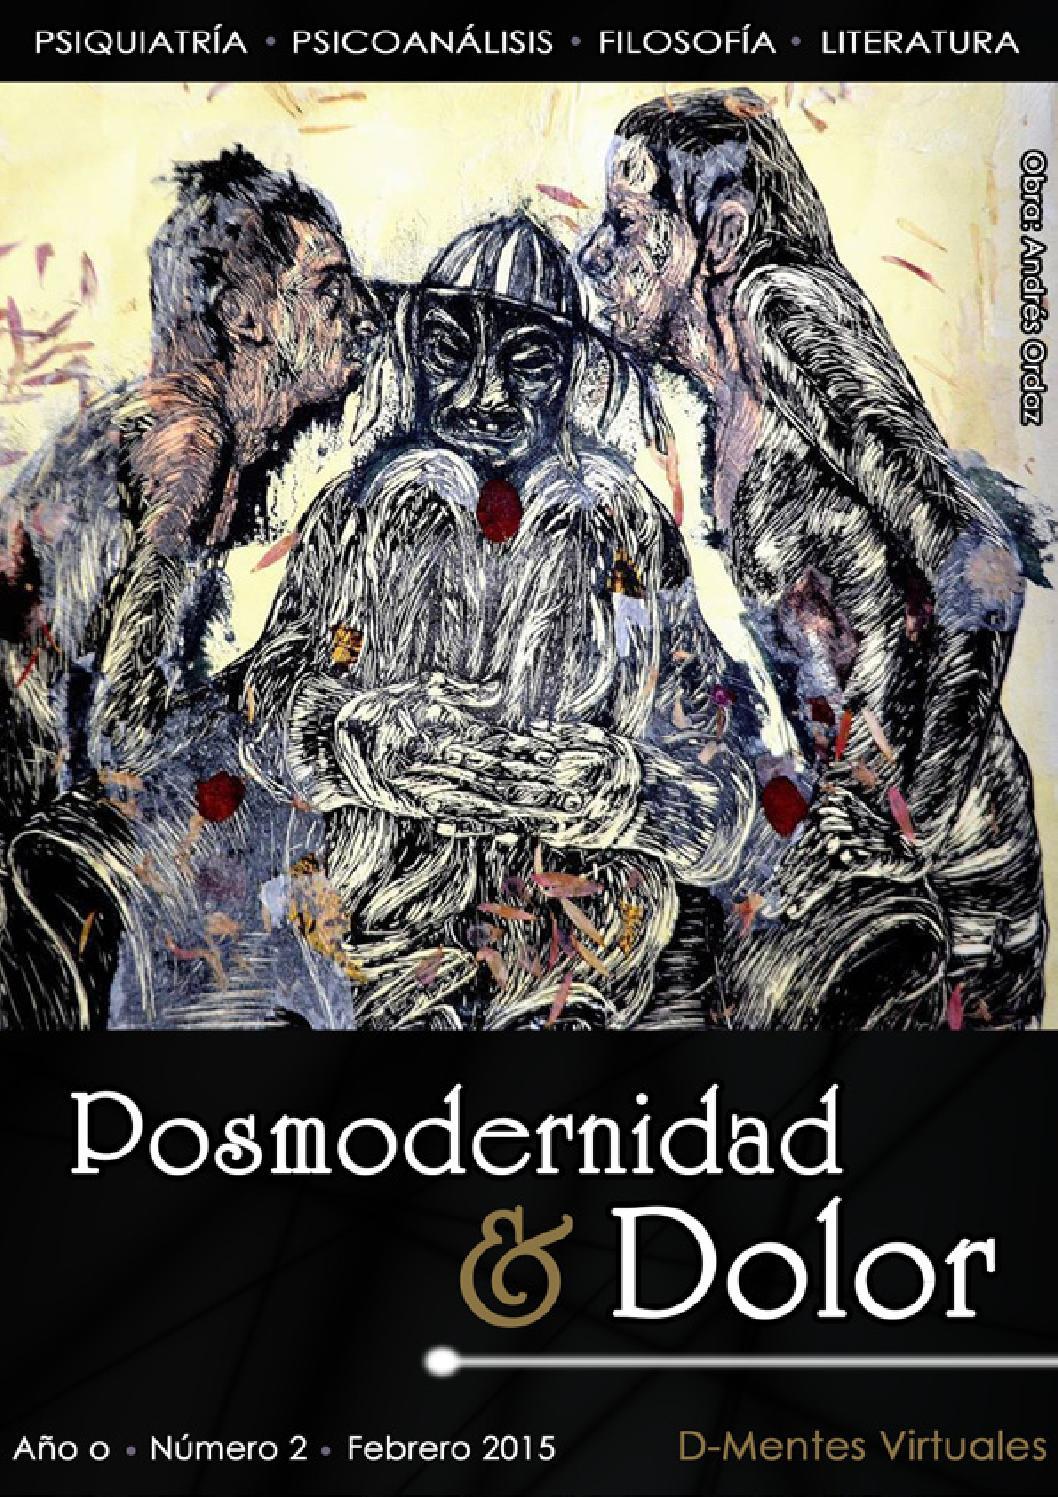 Posmodernidad y dolor final by D-Mentes Virtuales - issuu